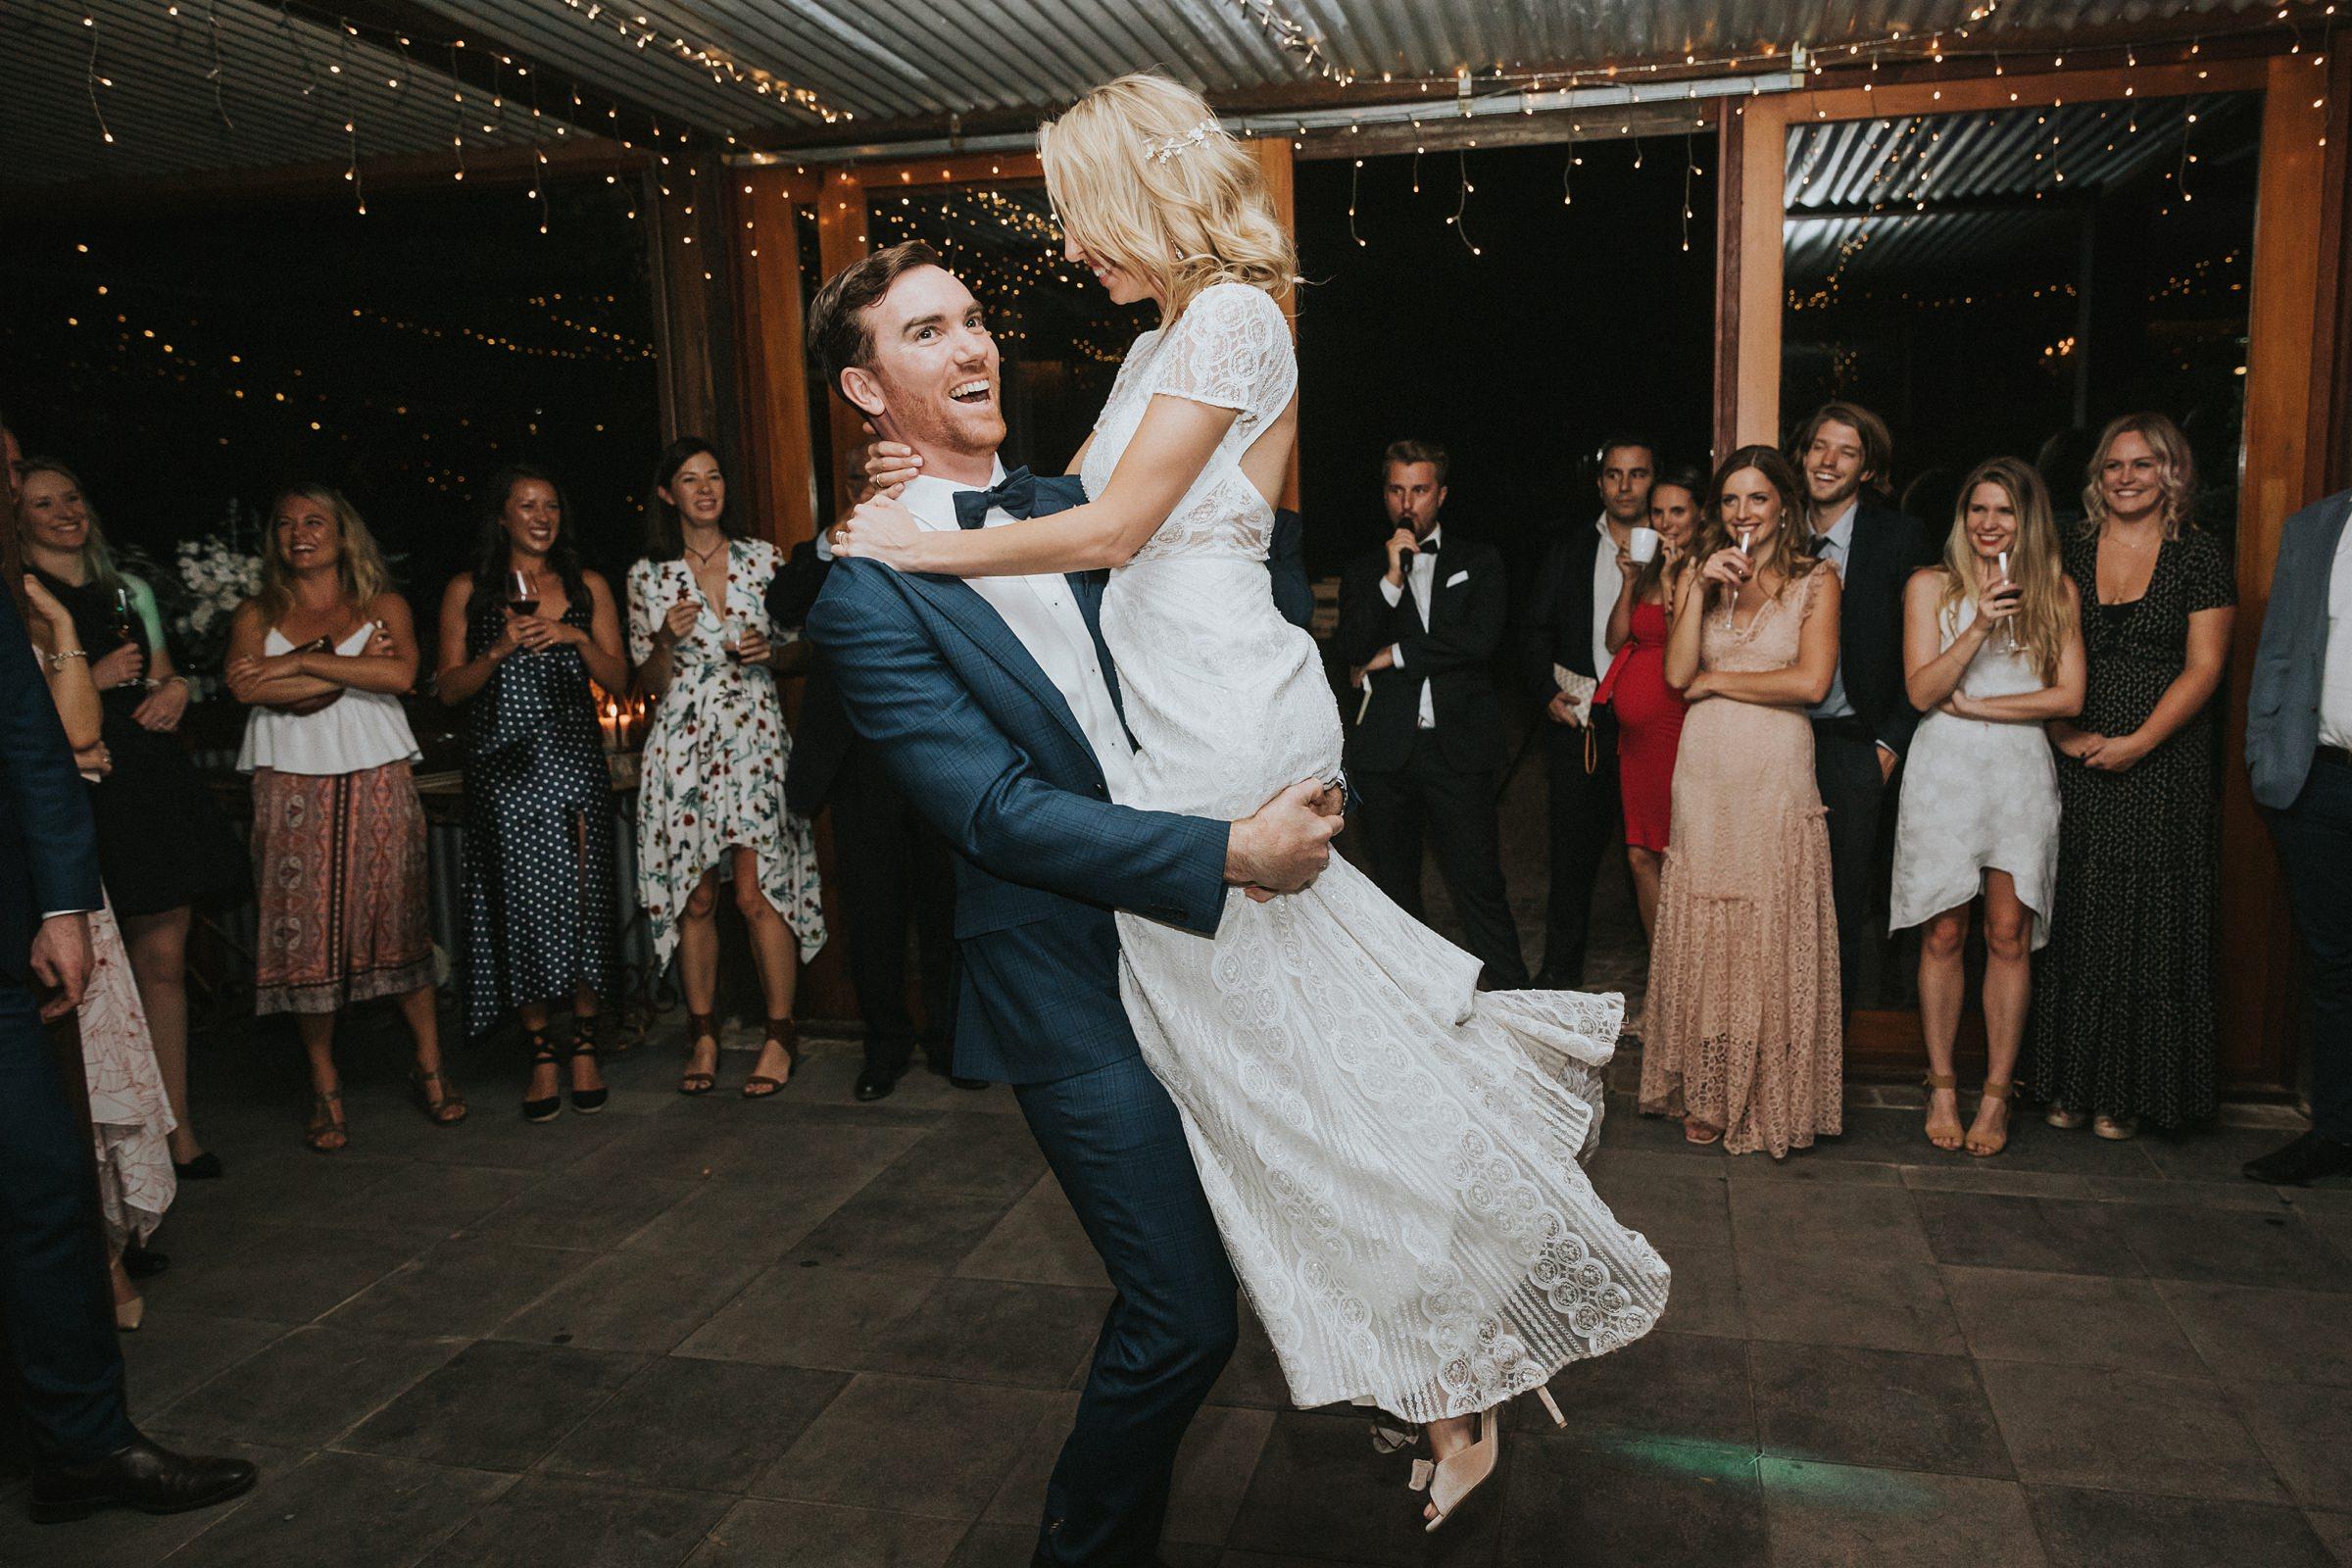 bridal waltz at mali brae farm dancefloor